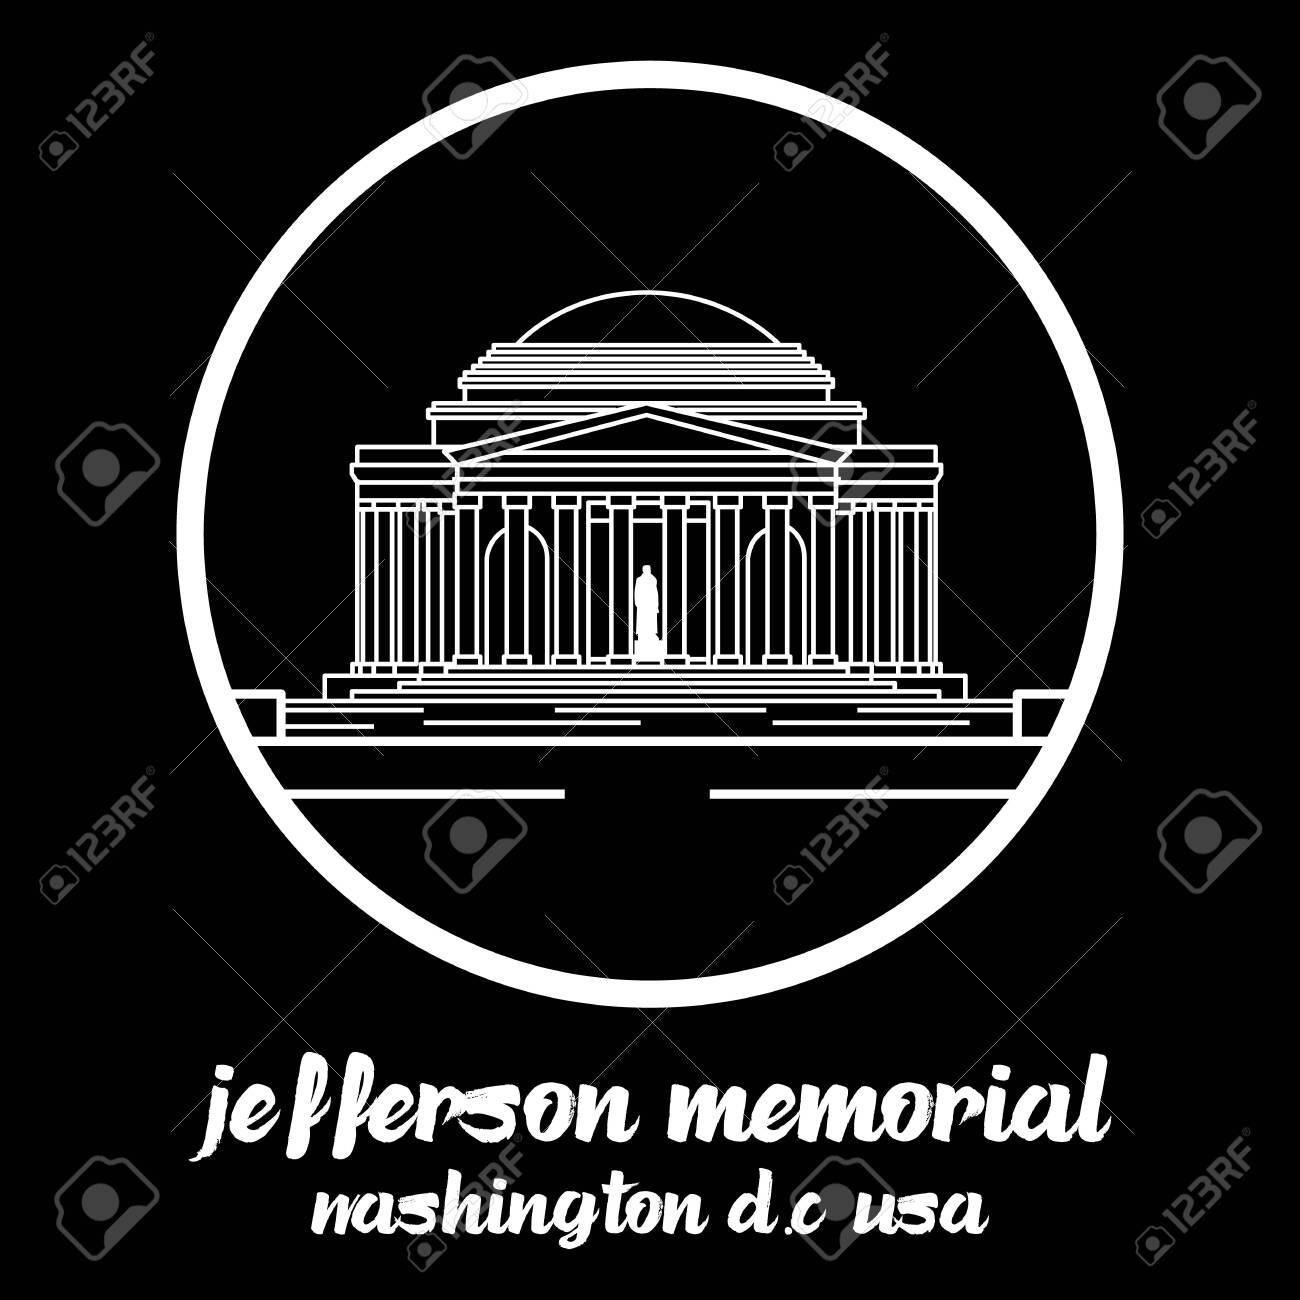 Circle Icon jefferson memorial.vector illustration - 133106660